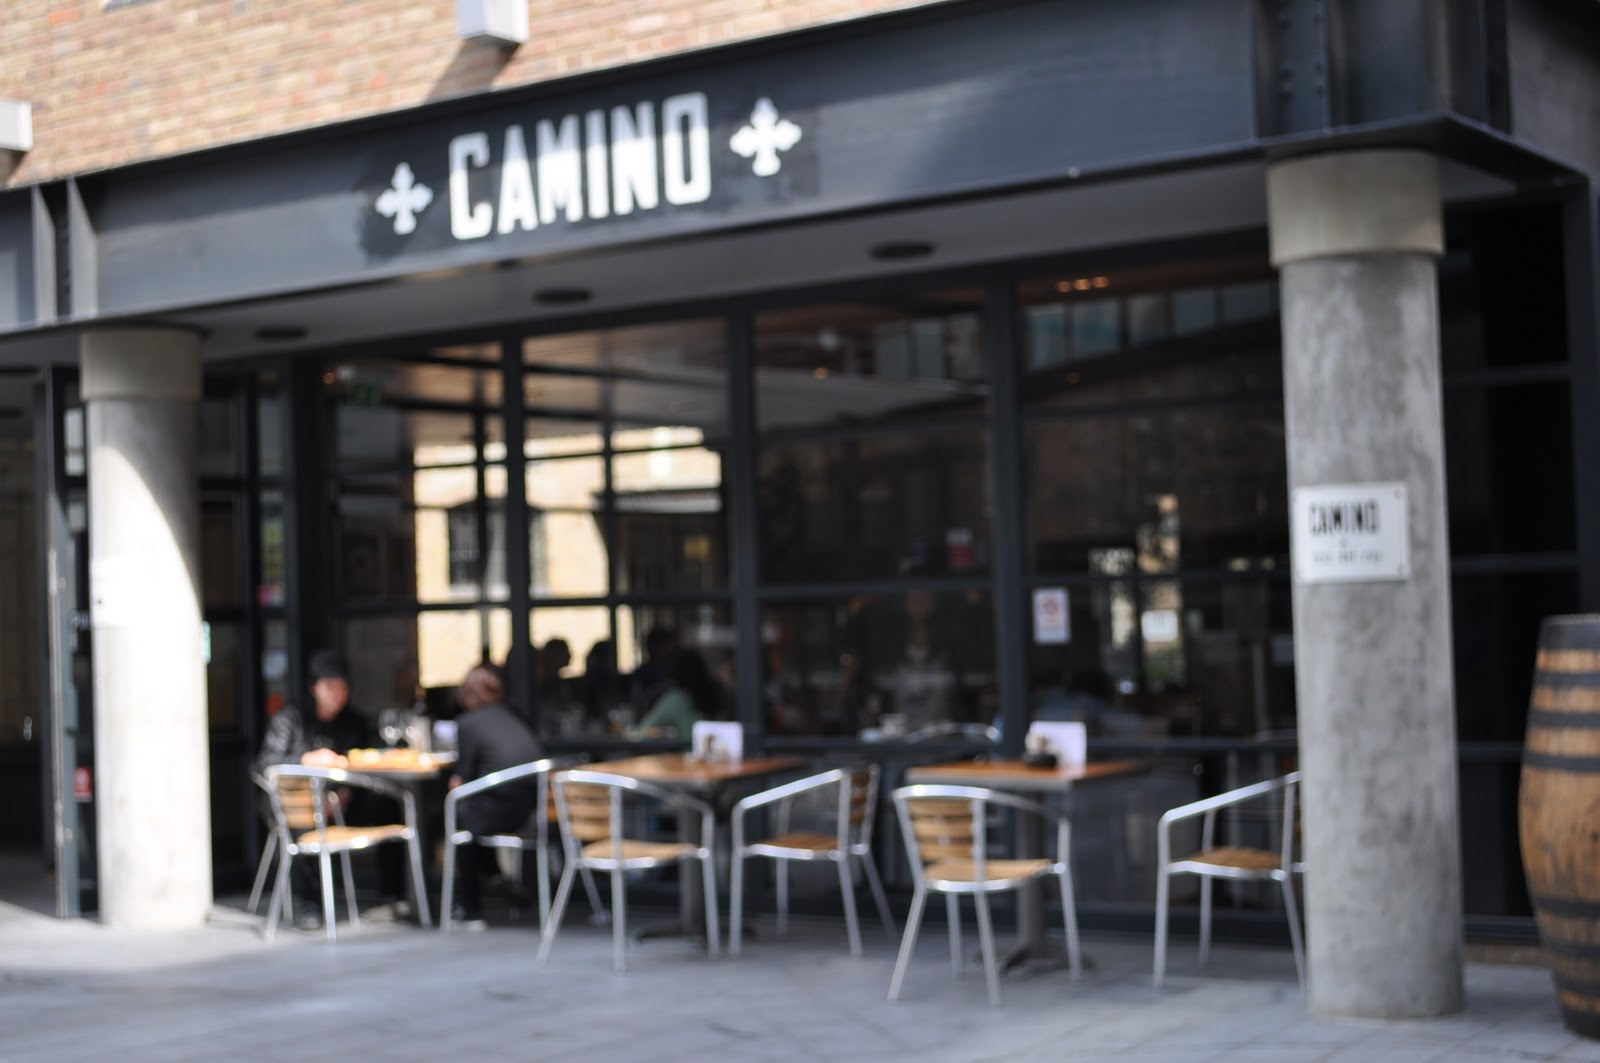 Guest Review Camino Kings Cross James Ramsden